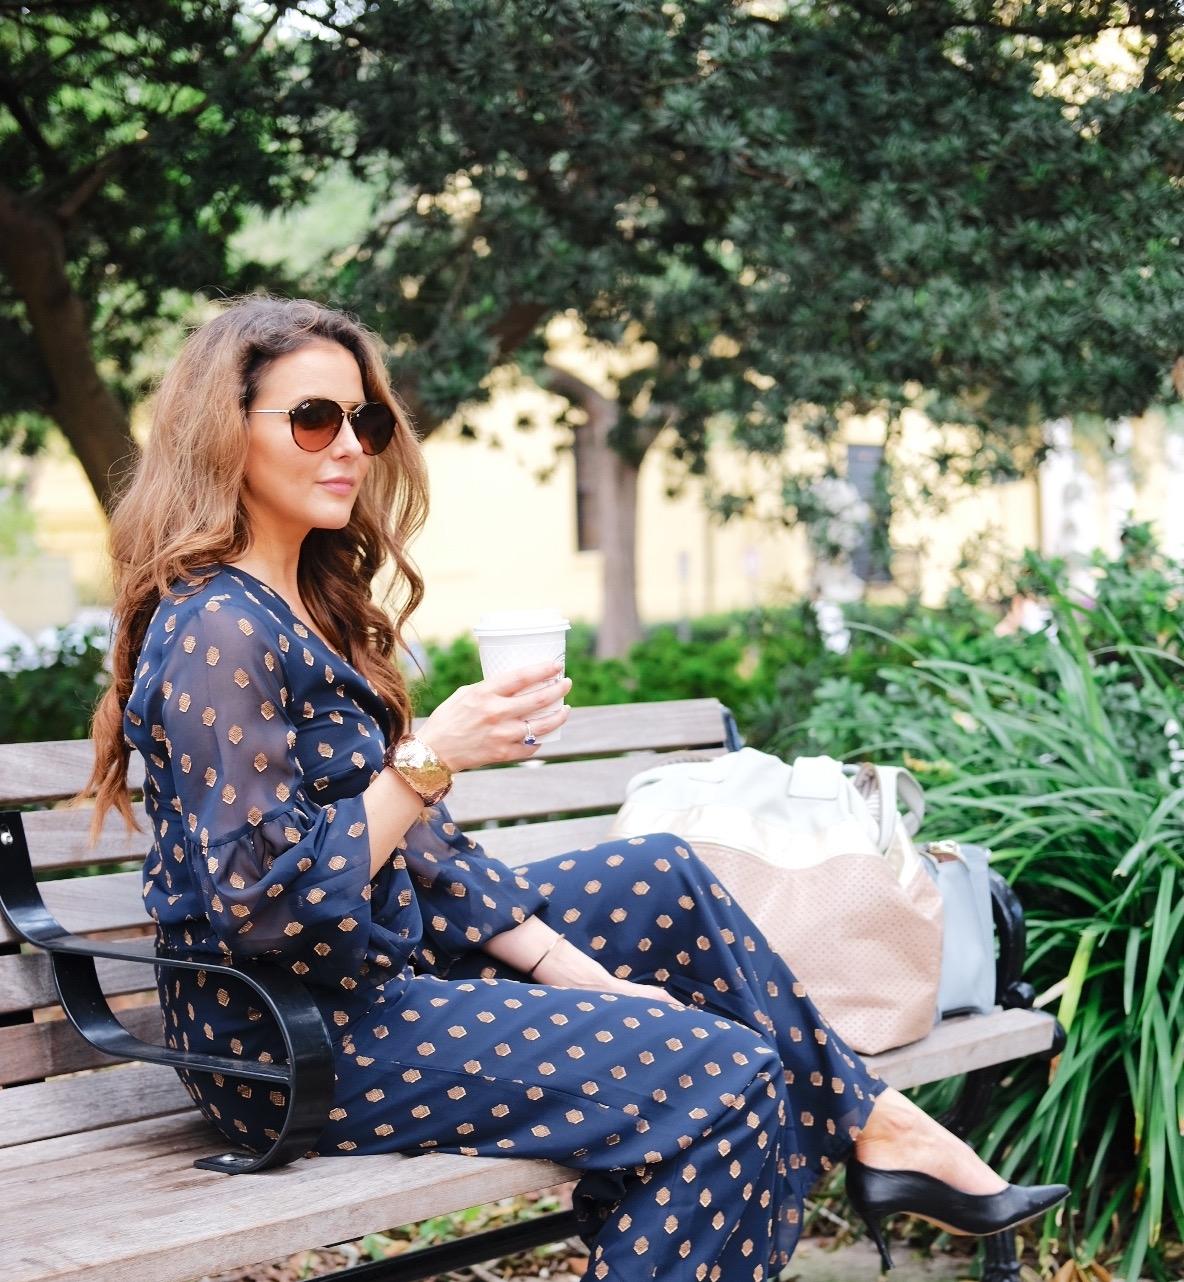 Brenna Lauren having coffee on bench in Navy Blue jumper